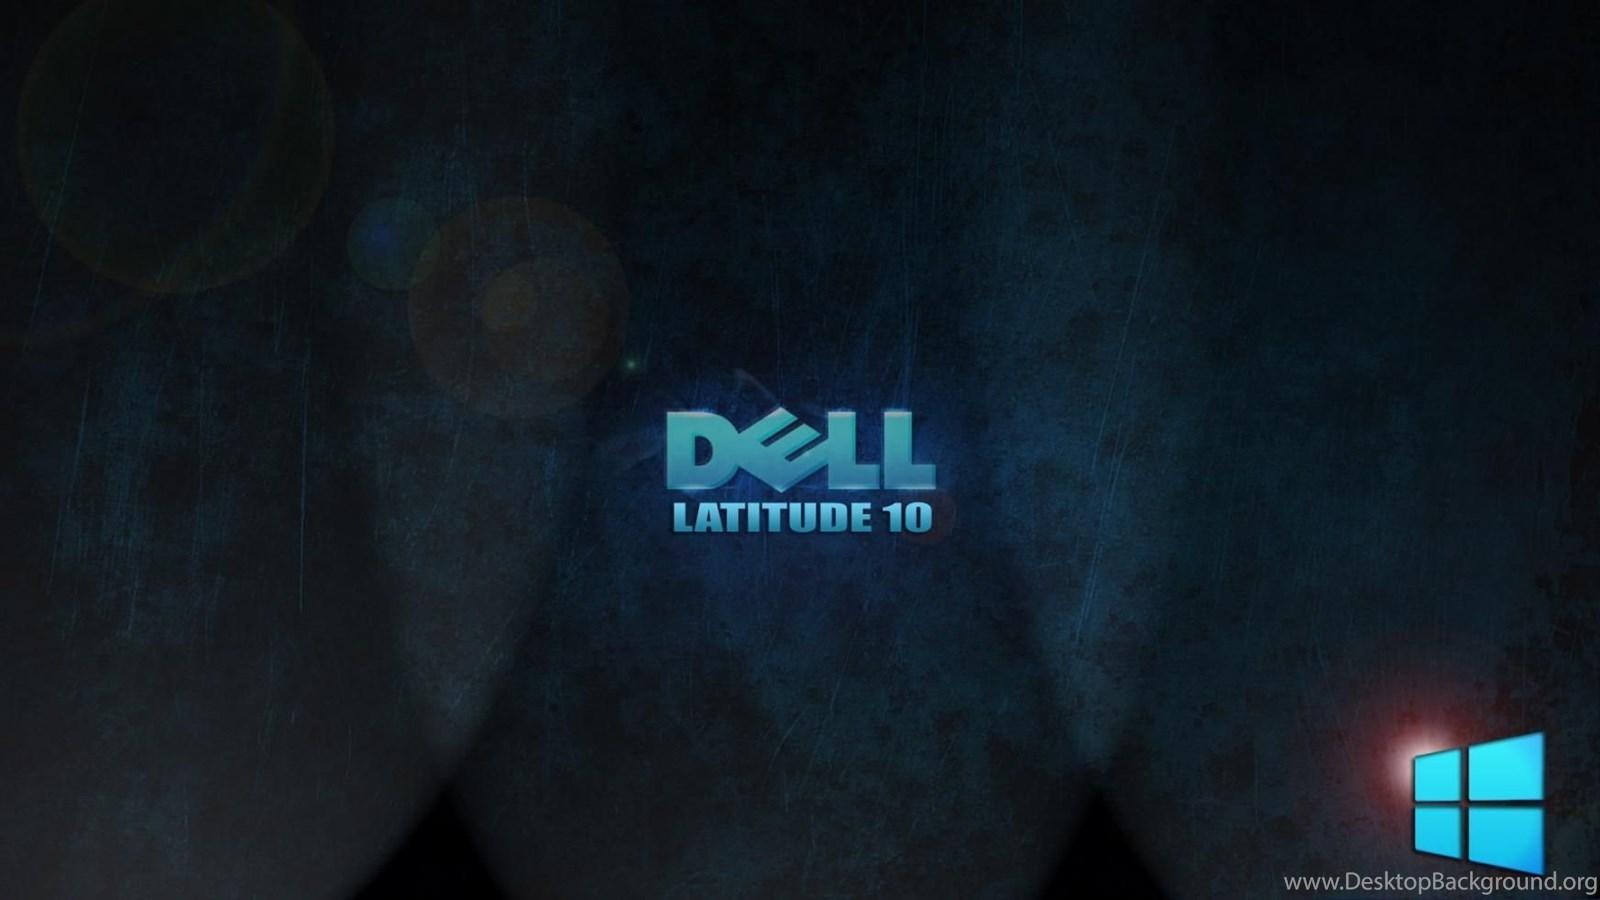 Dell Latitude Wallpaper Images 9488 Hd Pictures Desktop